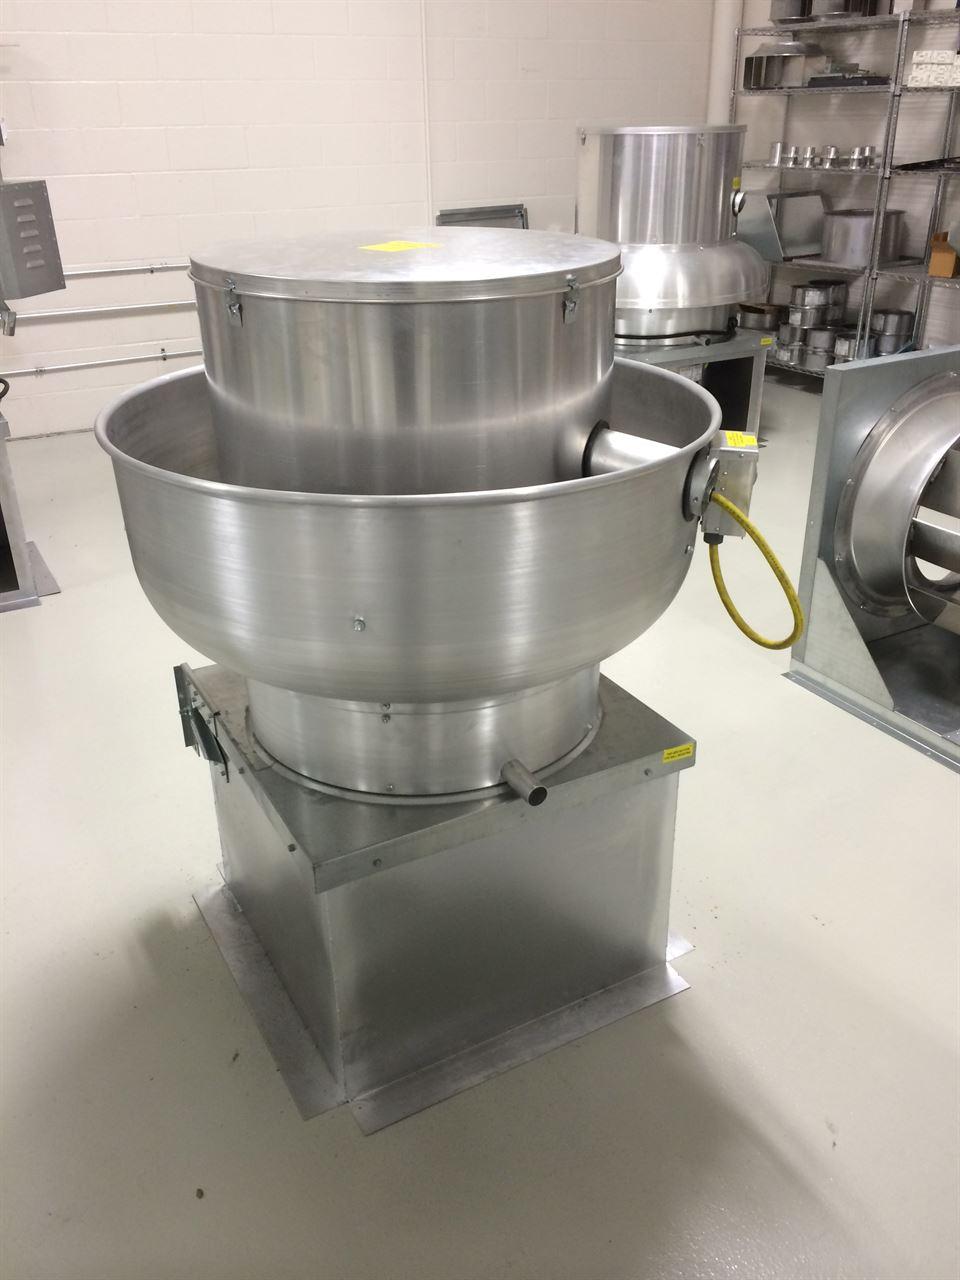 Picture of Belt Drive Upblast Exhaust Fan - 5500 CFM - 33